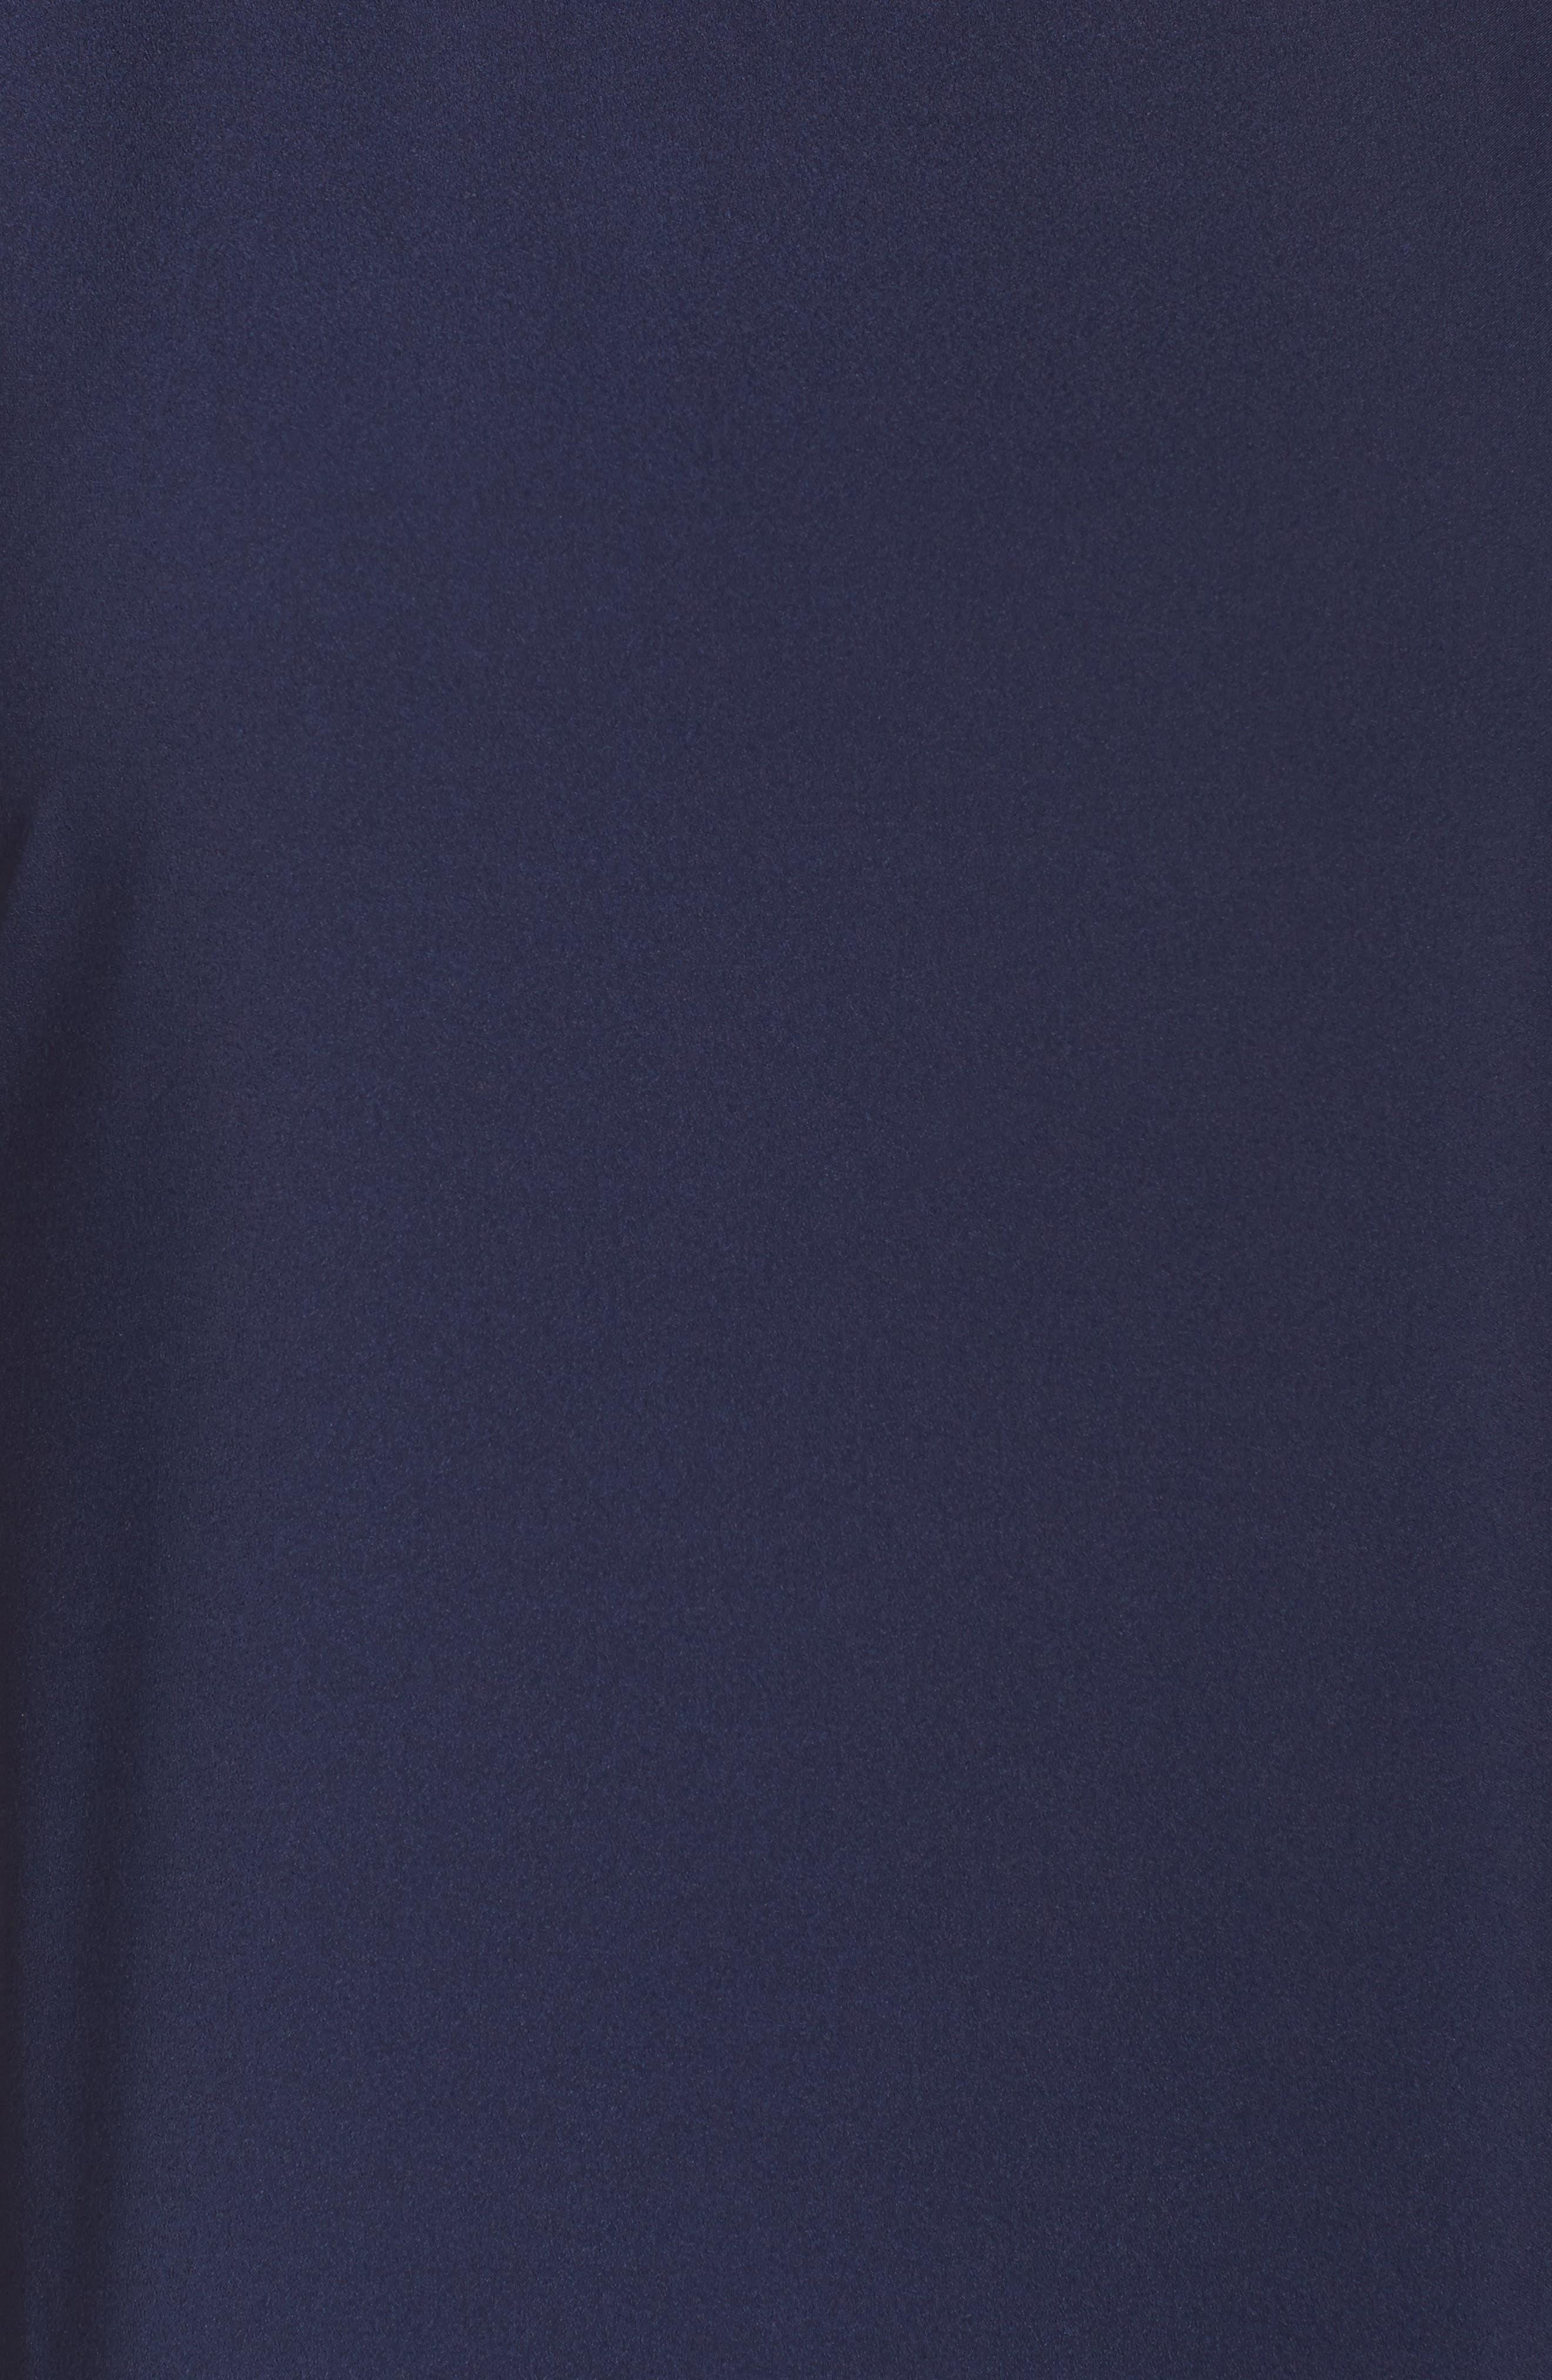 Embellished Slit Sleeve Blouse,                             Alternate thumbnail 5, color,                             Navy Peacoat